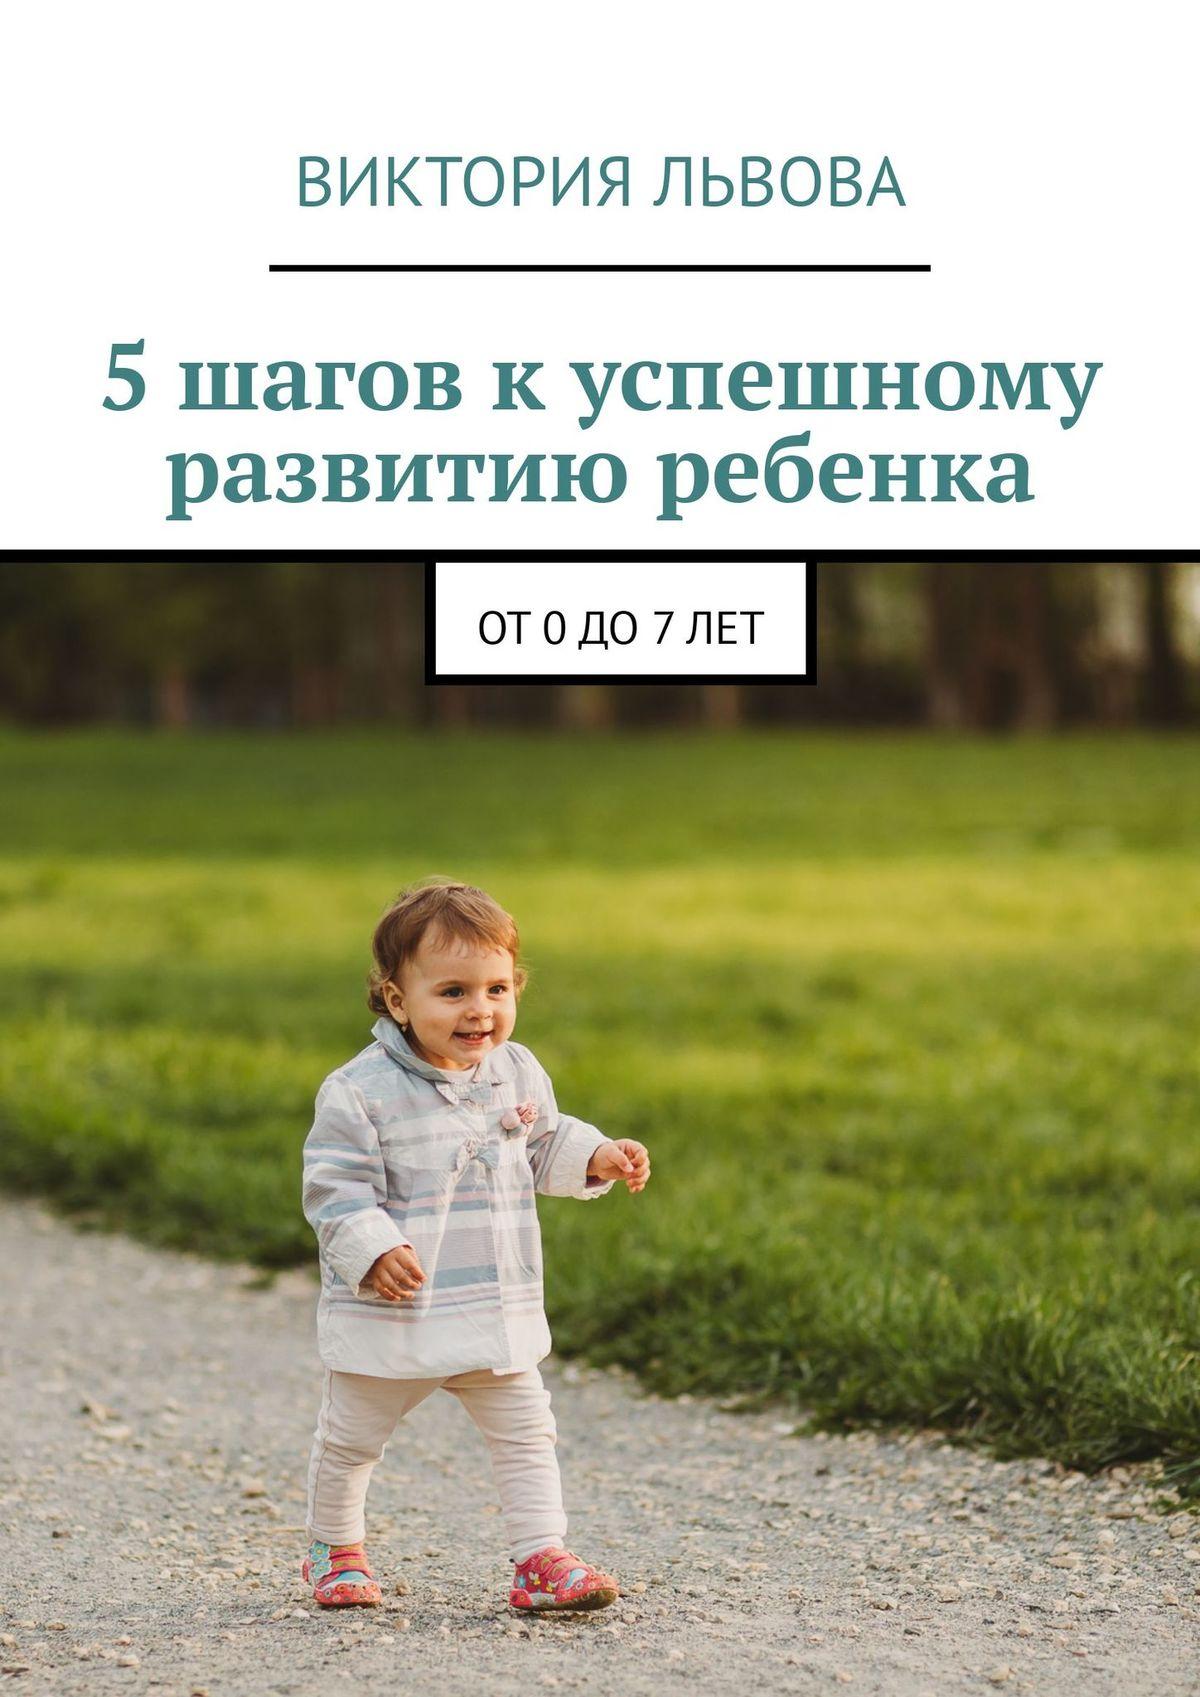 5шагов куспешному развитию ребенка от0до7лет